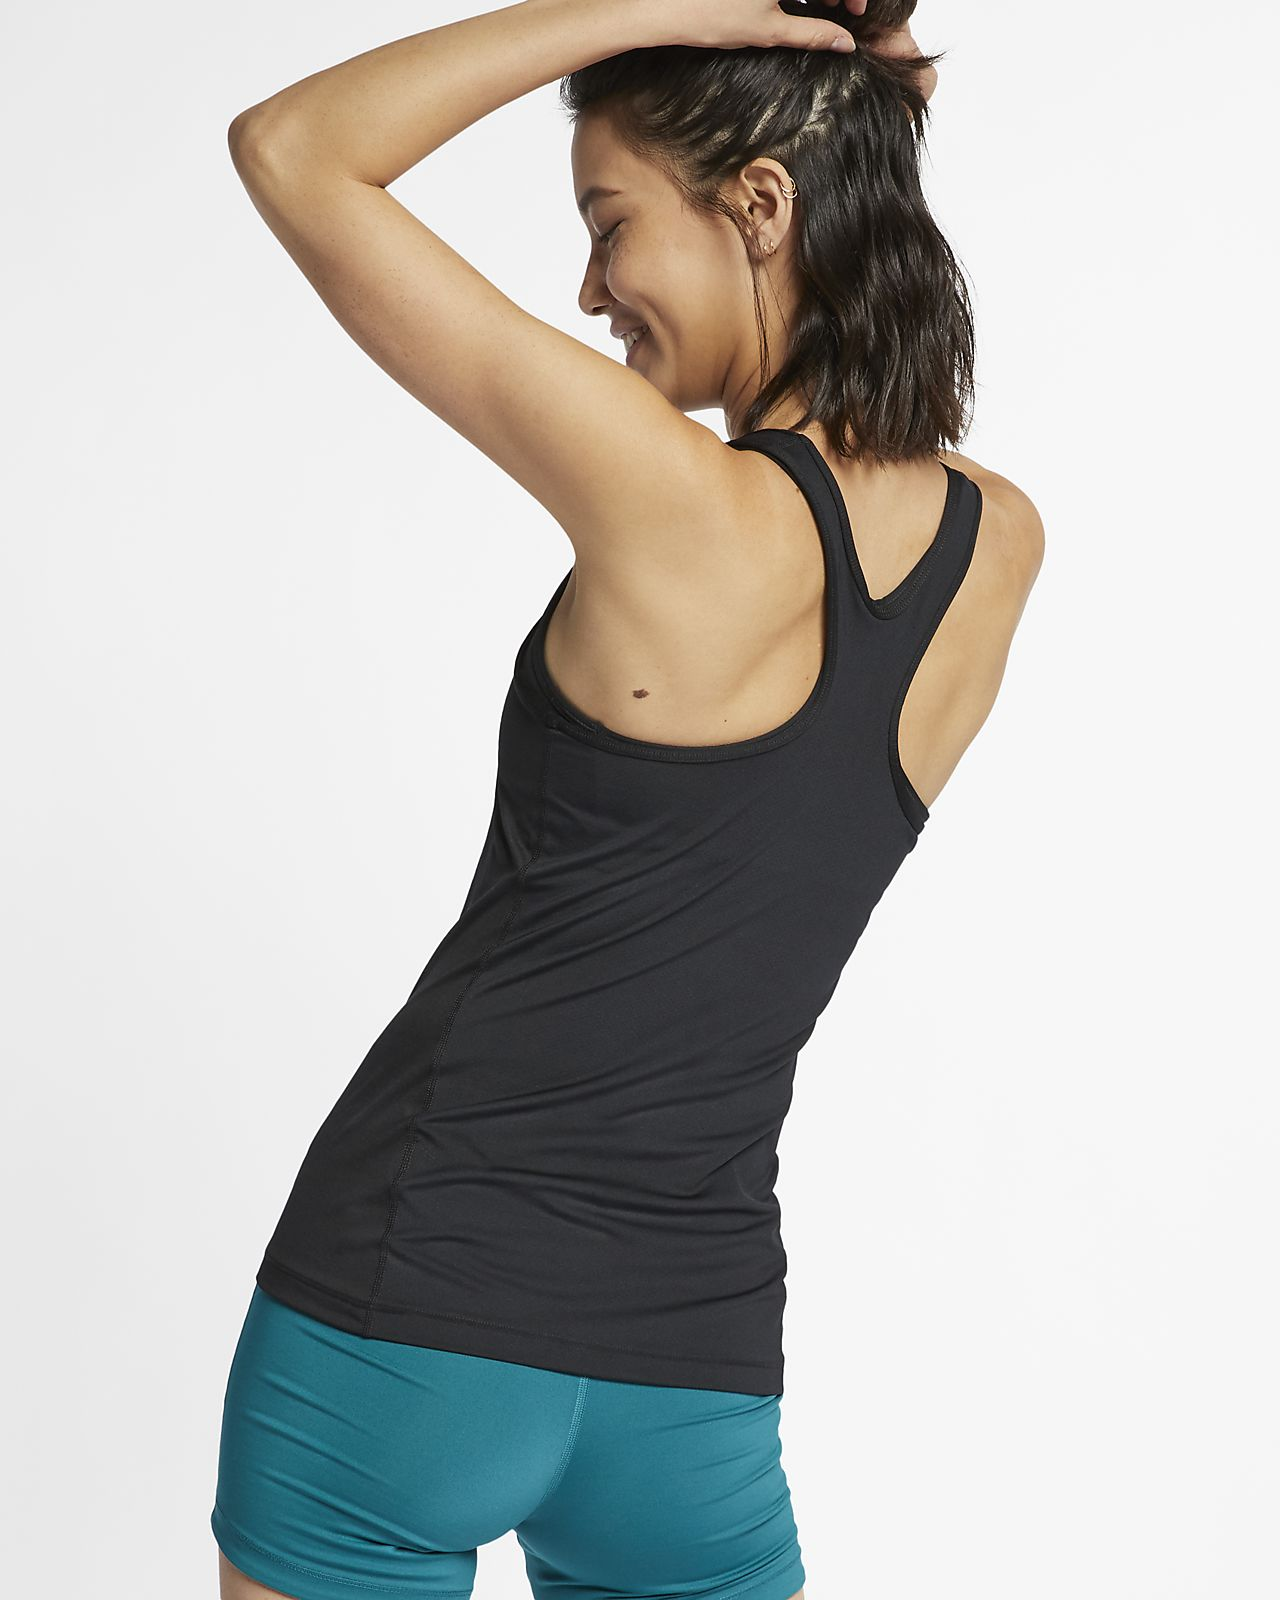 051b590c9e4 Женская майка для тренинга Nike Victory. Nike.com RU